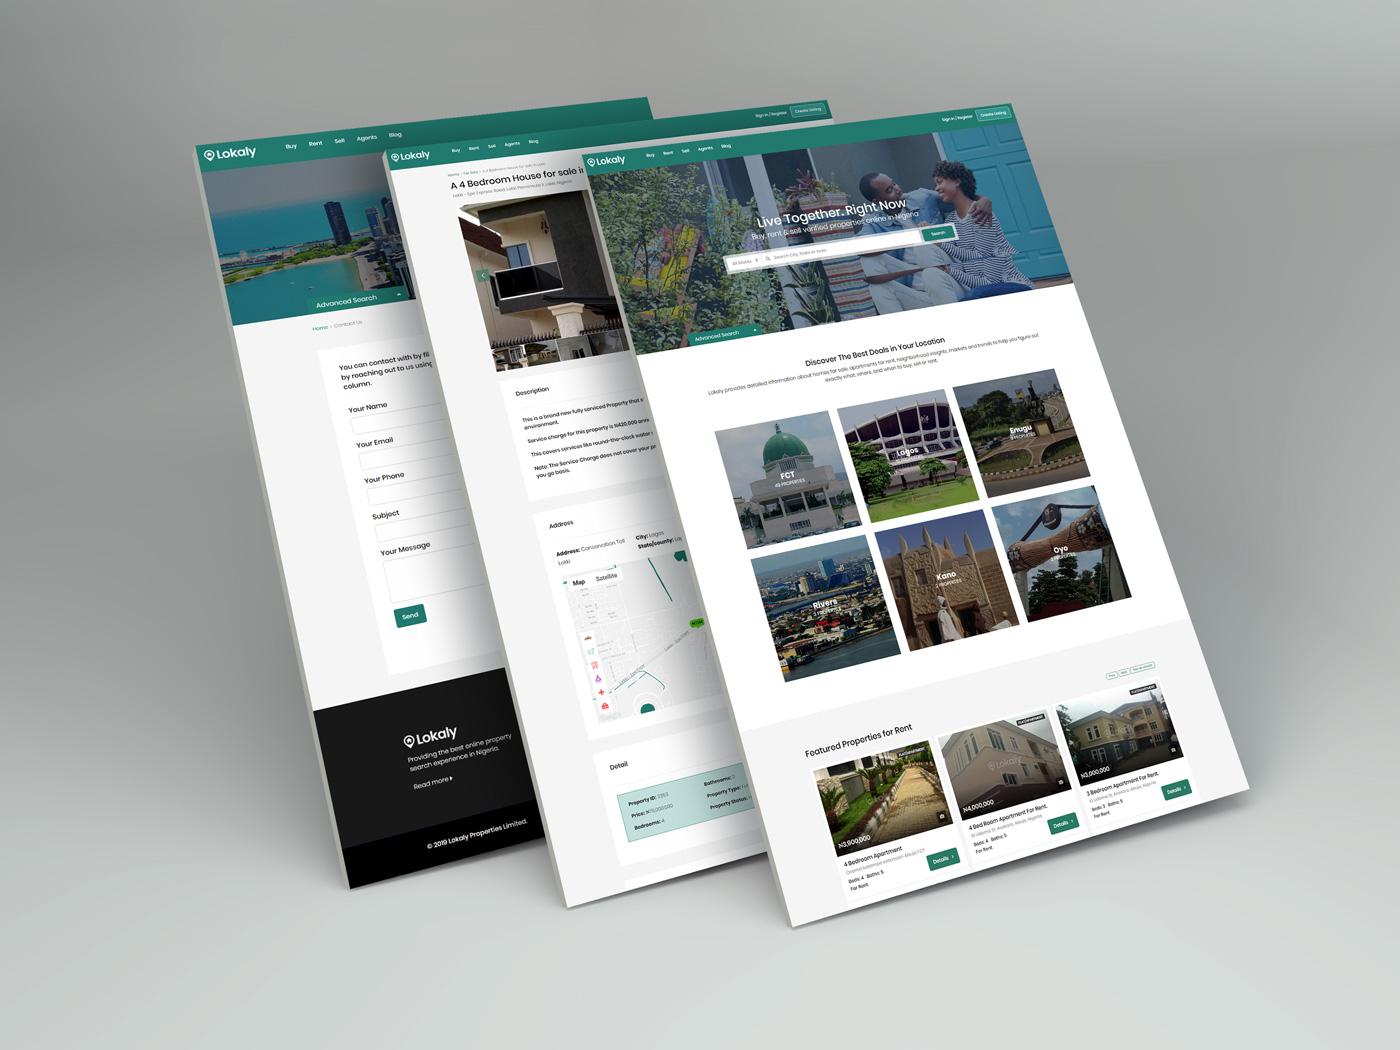 lokaly website portfolio